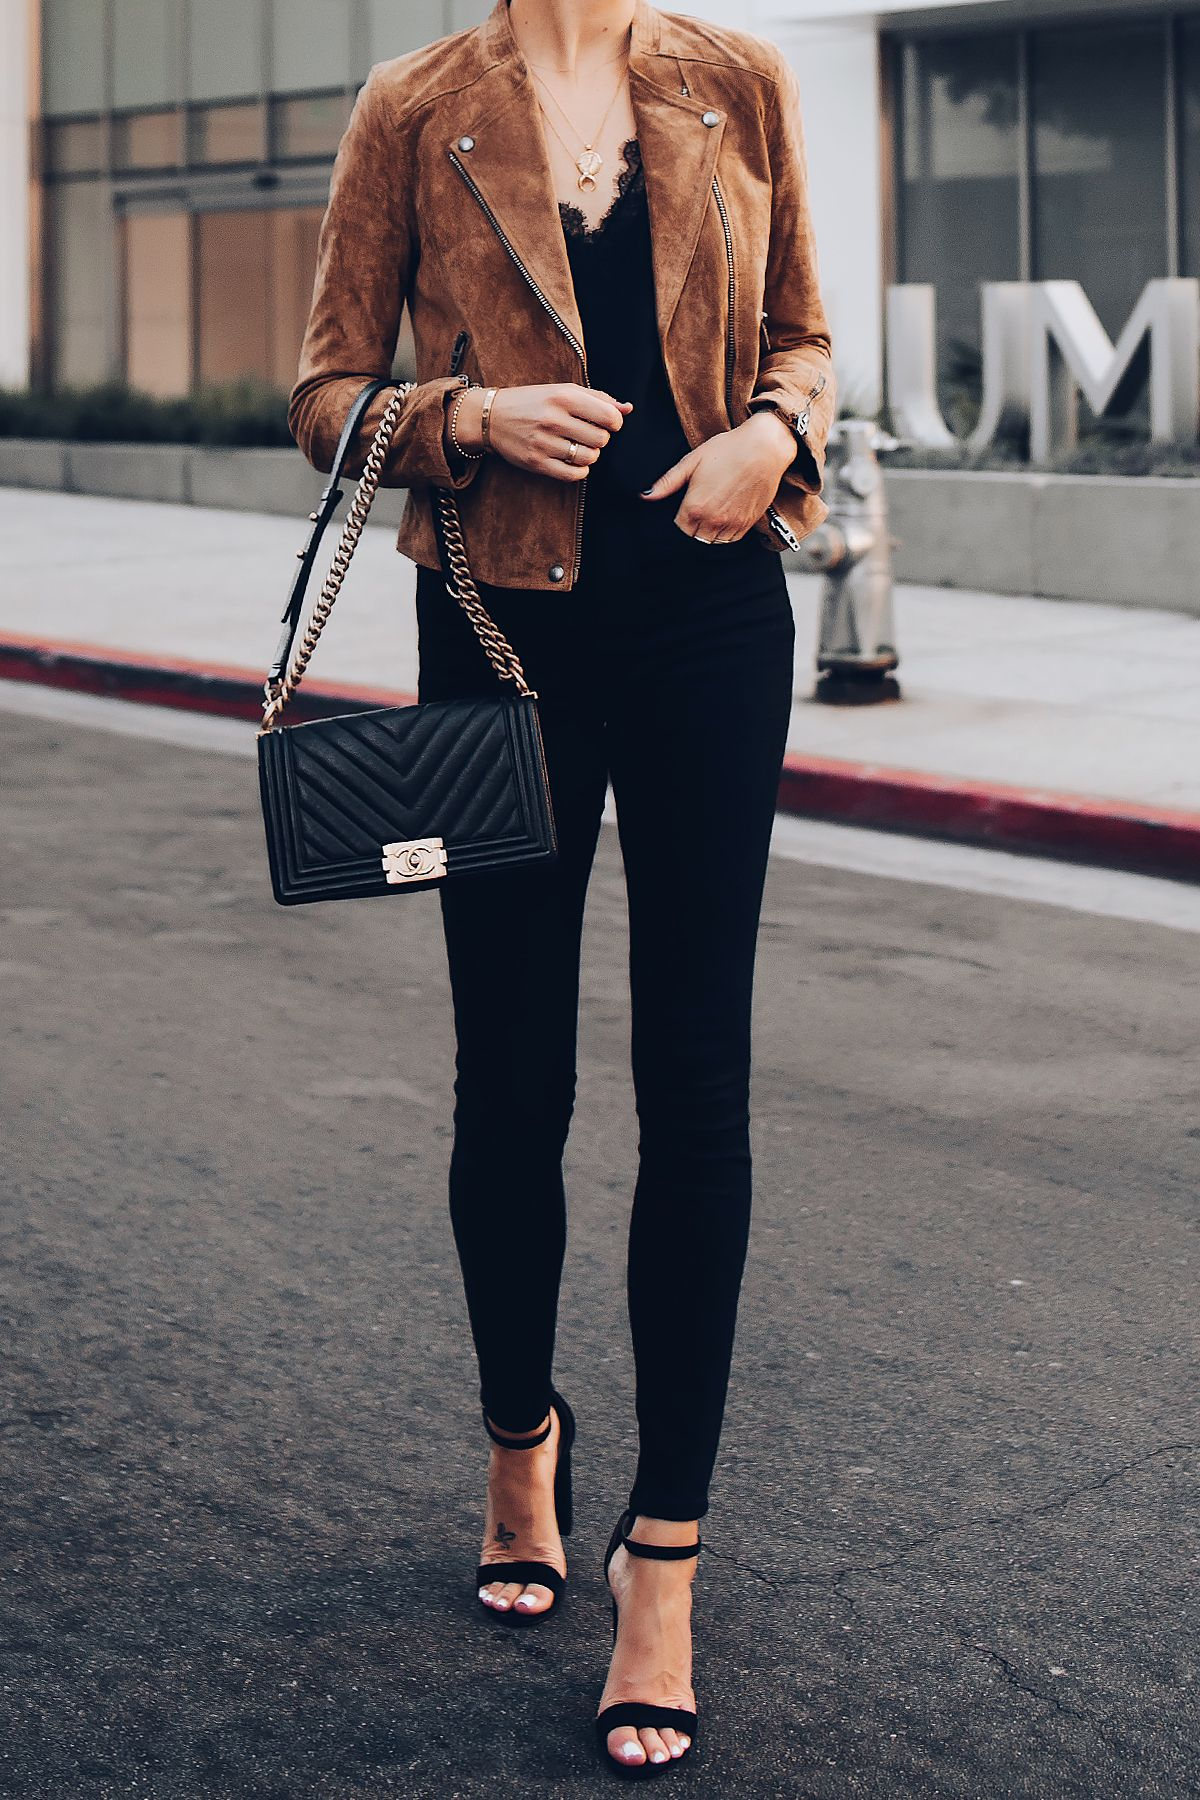 36d1e938dd7 Blonde Woman Wearing Blanknyc Tan Suede Moto Jacket Black Lace Cami  Everlane Black Skinny Jeans Black Ankle Strap Heeled Sandals Chanel Black  Boy Bag ...